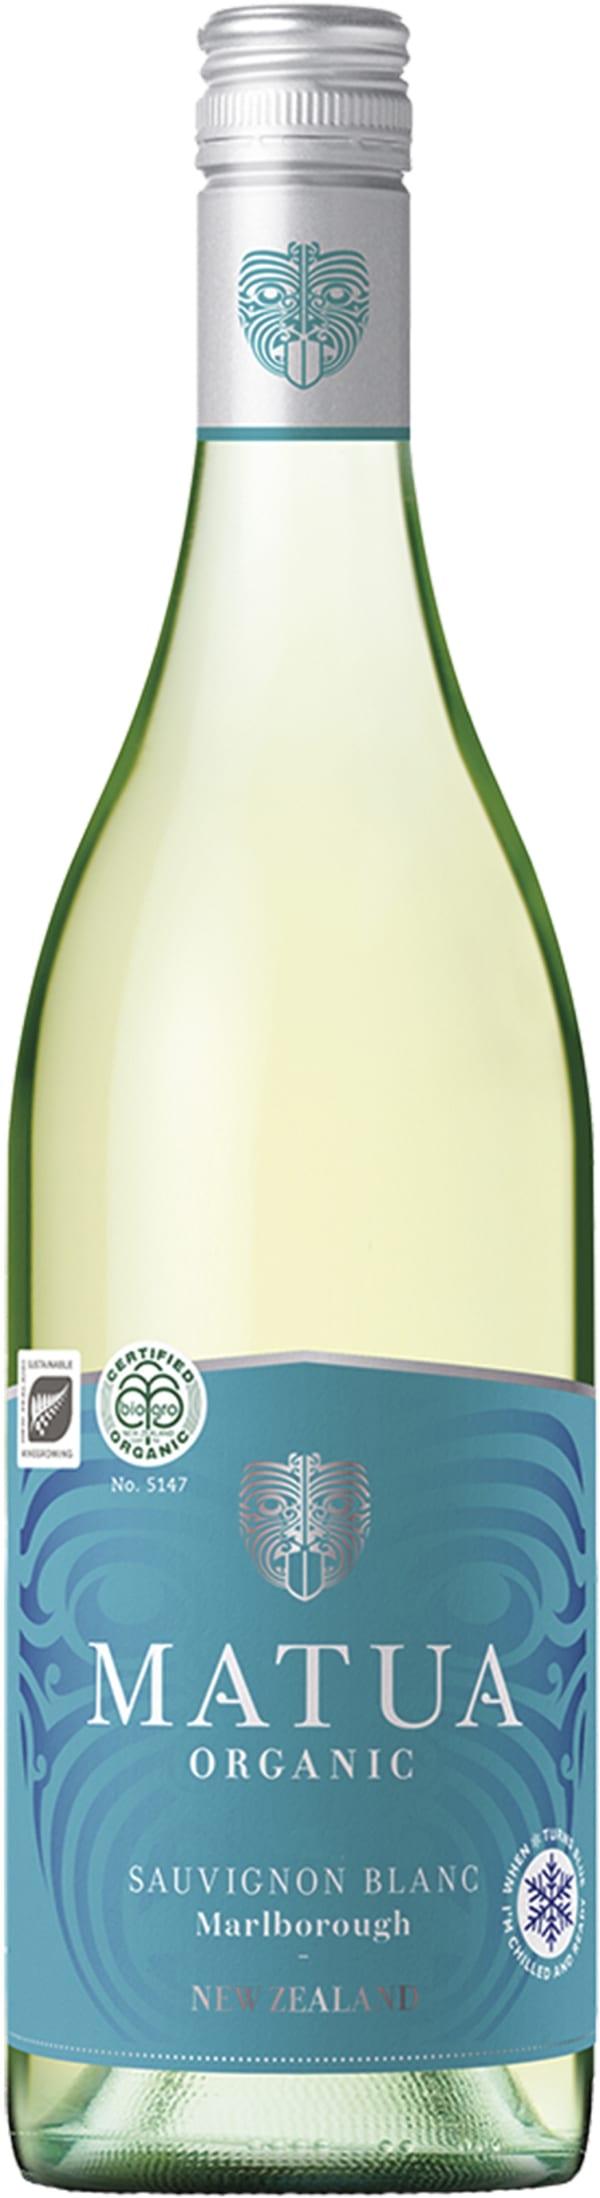 Matua Organic Sauvignon Blanc 2017